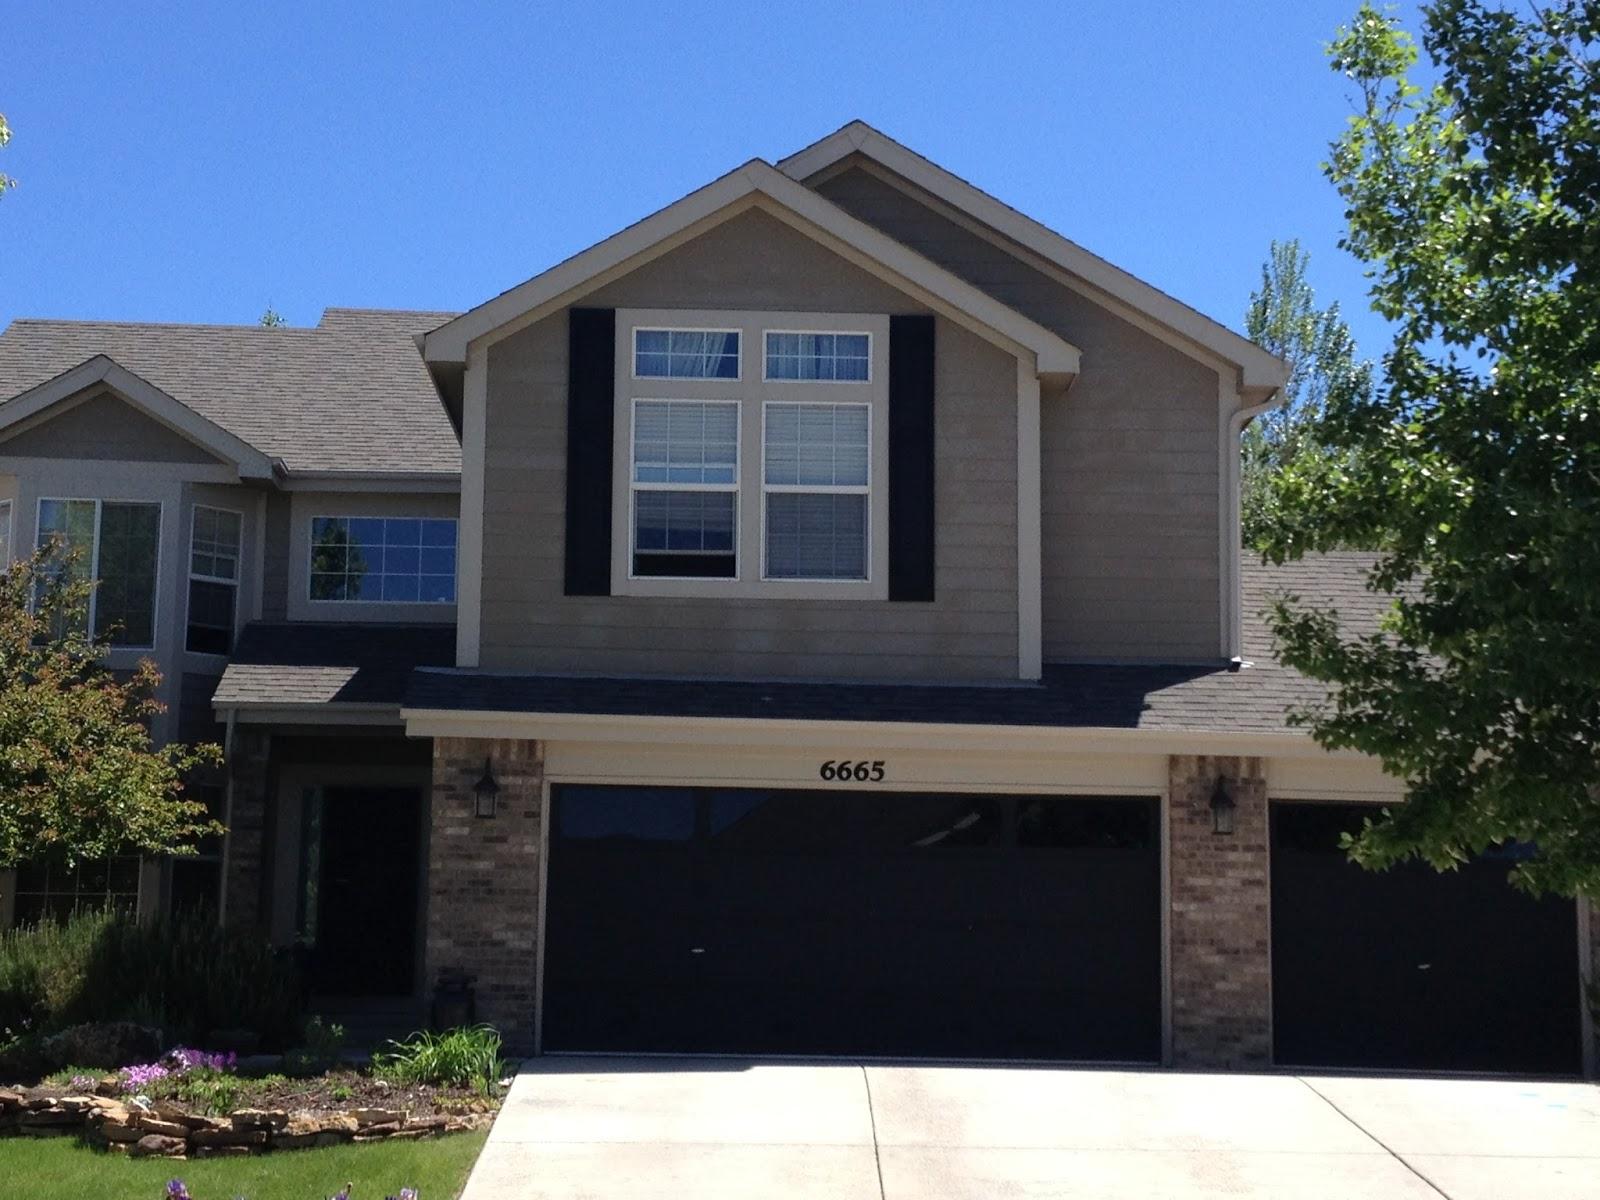 Grey house black garage doors - 1200 0a59c1 Cream Trim And Black Accents We Have Black Garage Doors And Shutters